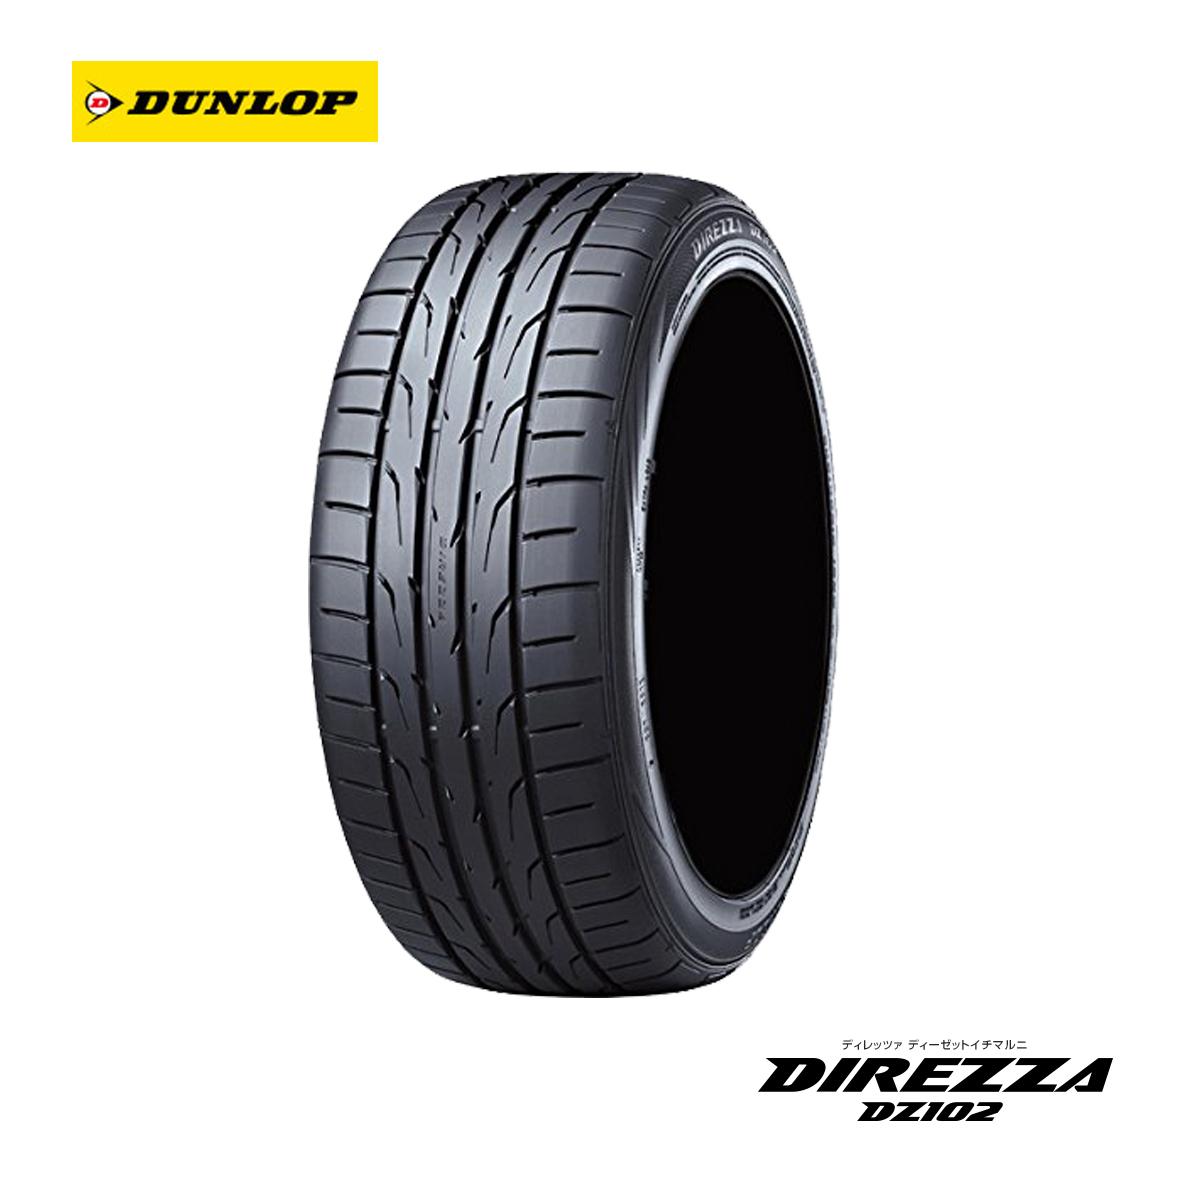 DUNLOP ダンロップ スポーツ サマータイヤ 4本 セット 17インチ 205/45R17 DIREZZA DZ102 ディレッツァ